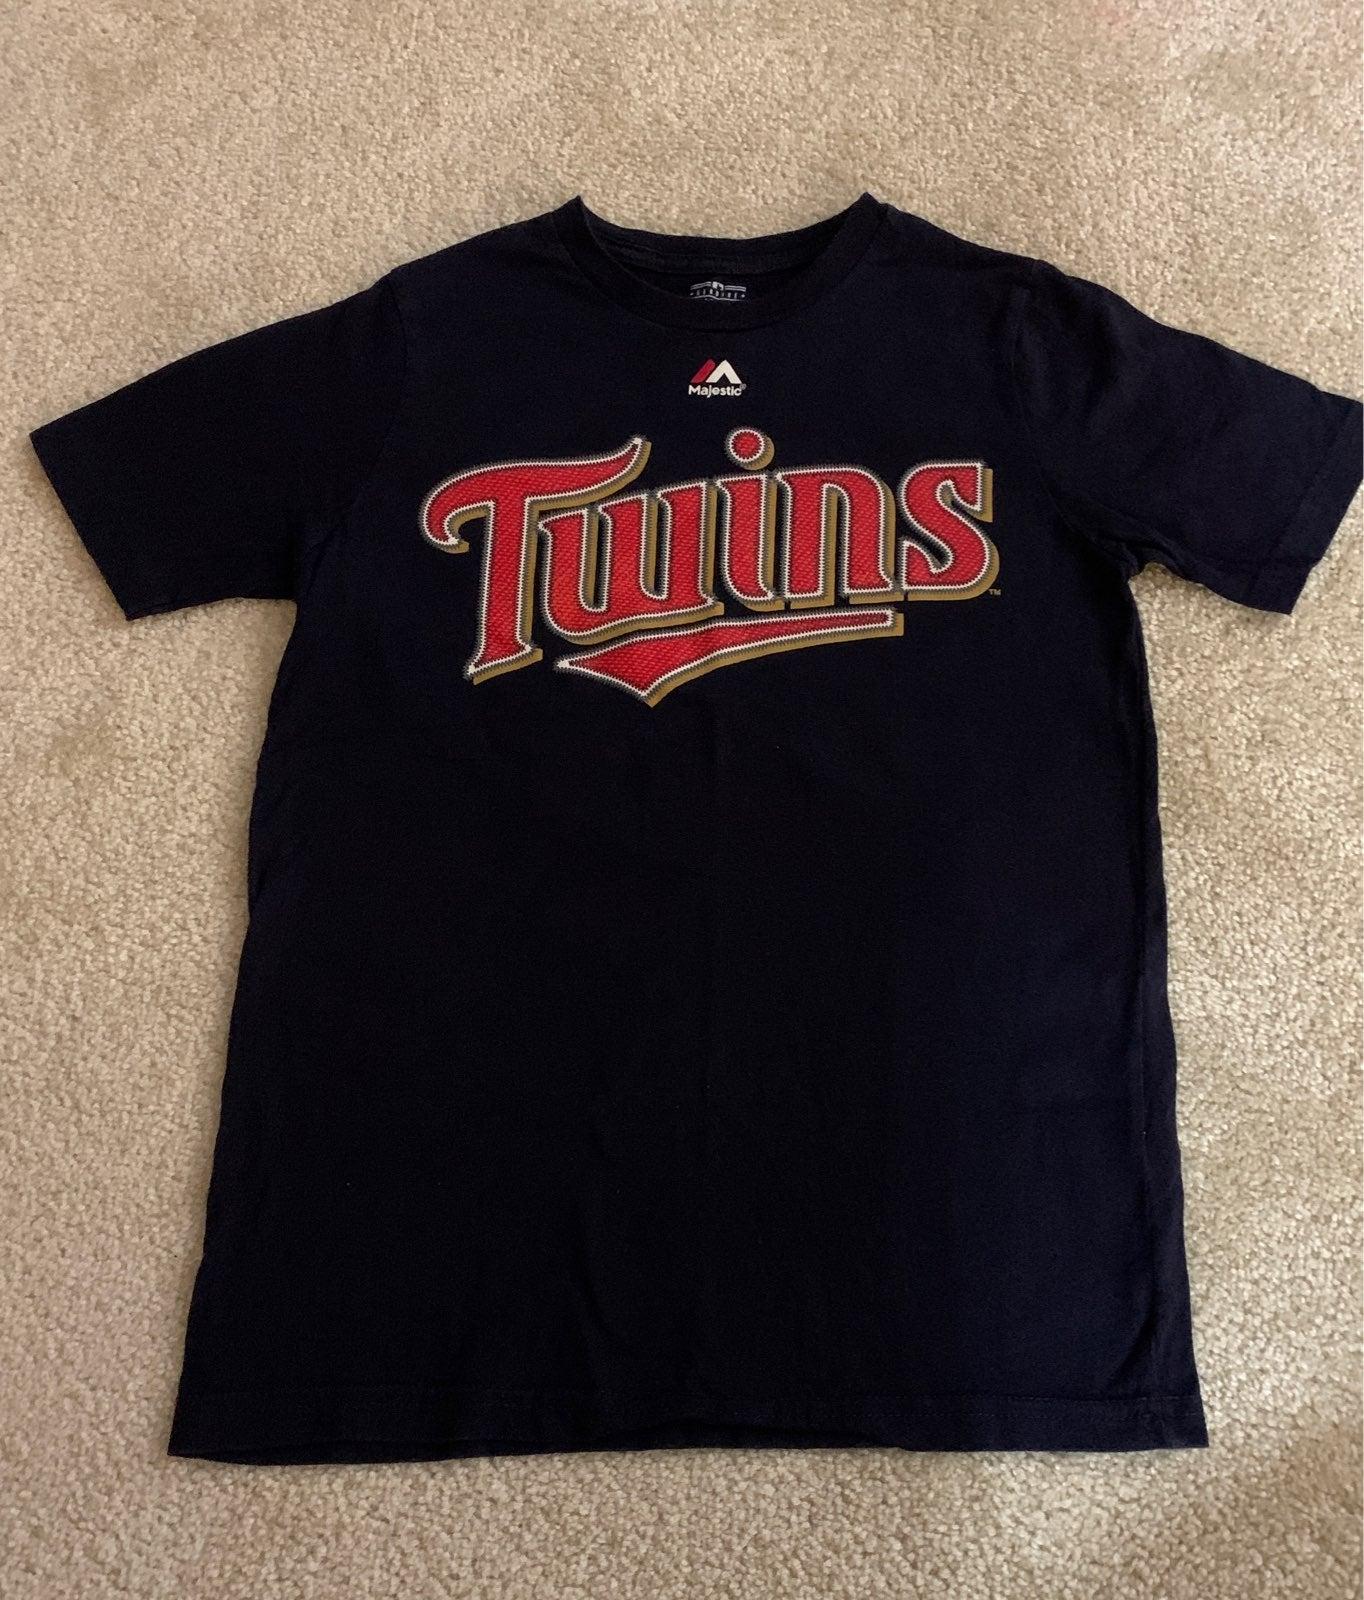 Twins shirt for boy